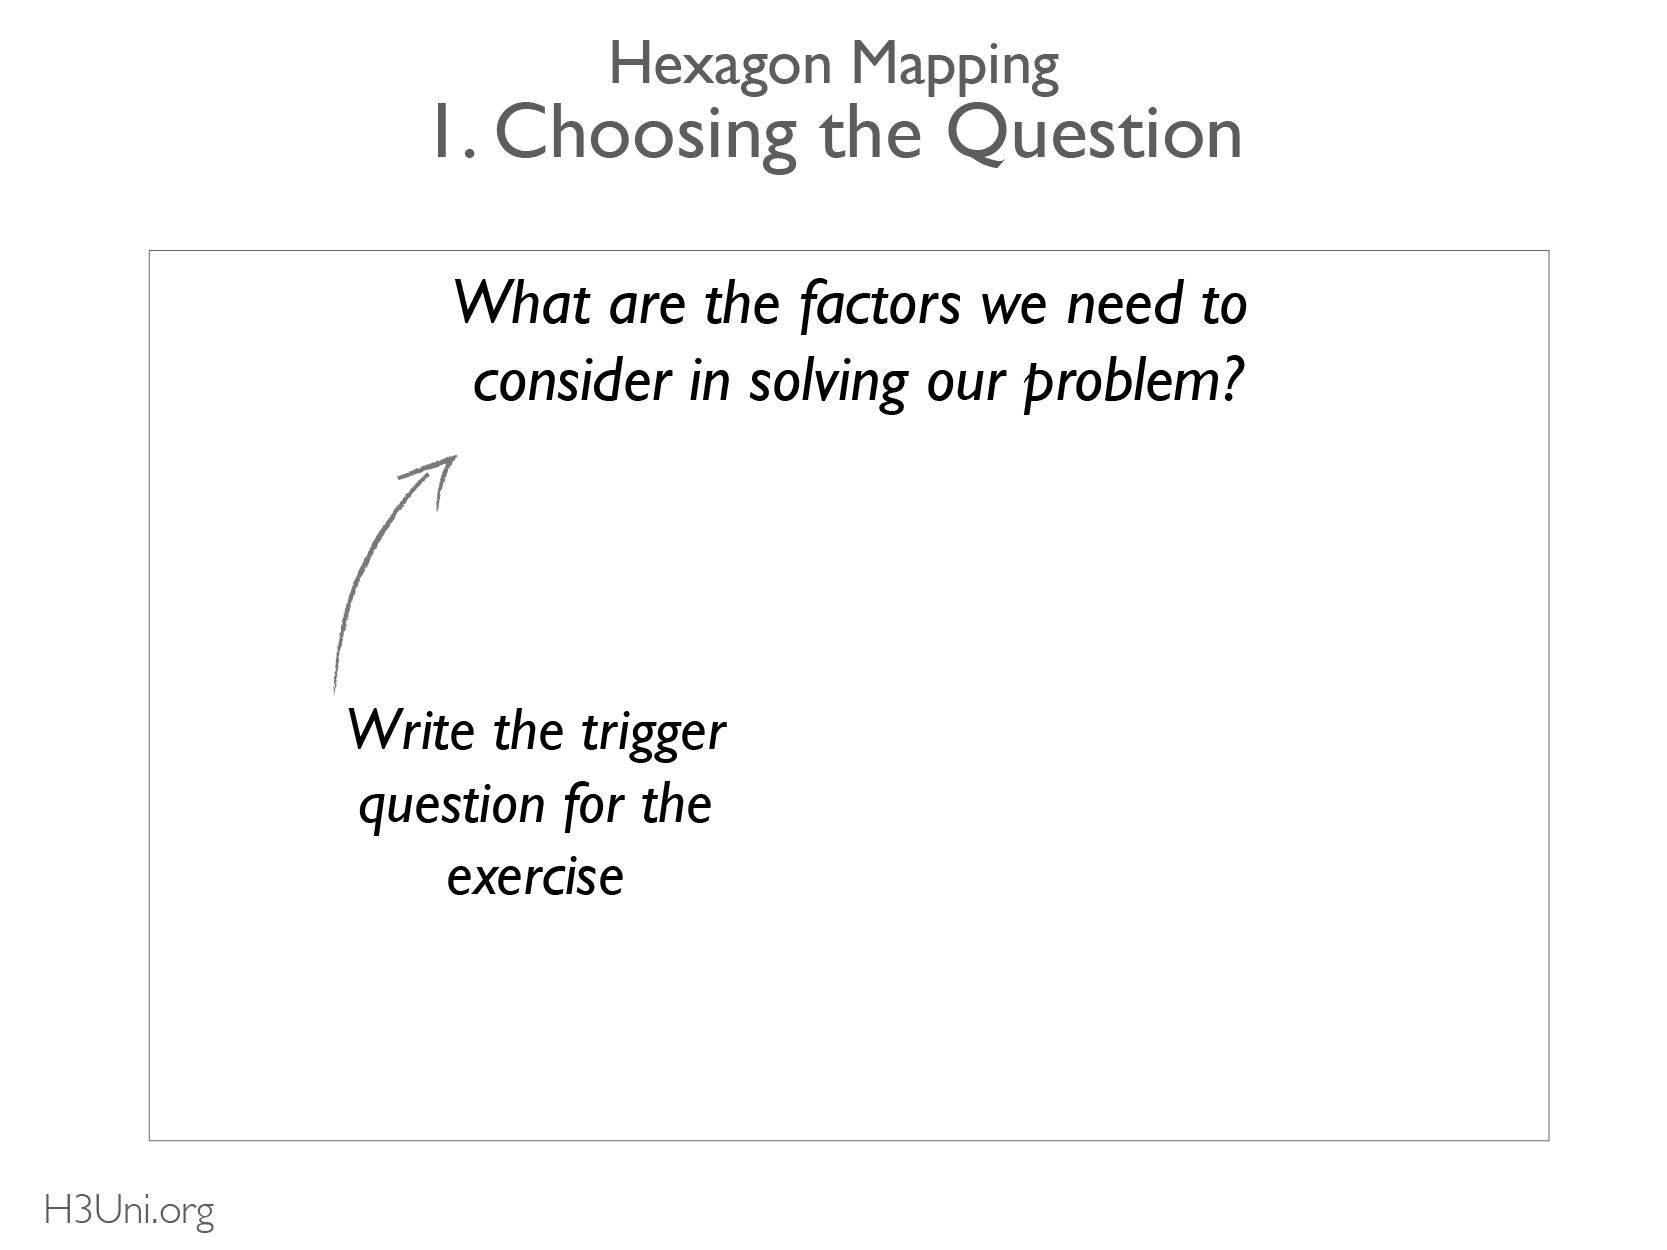 Choosing the question